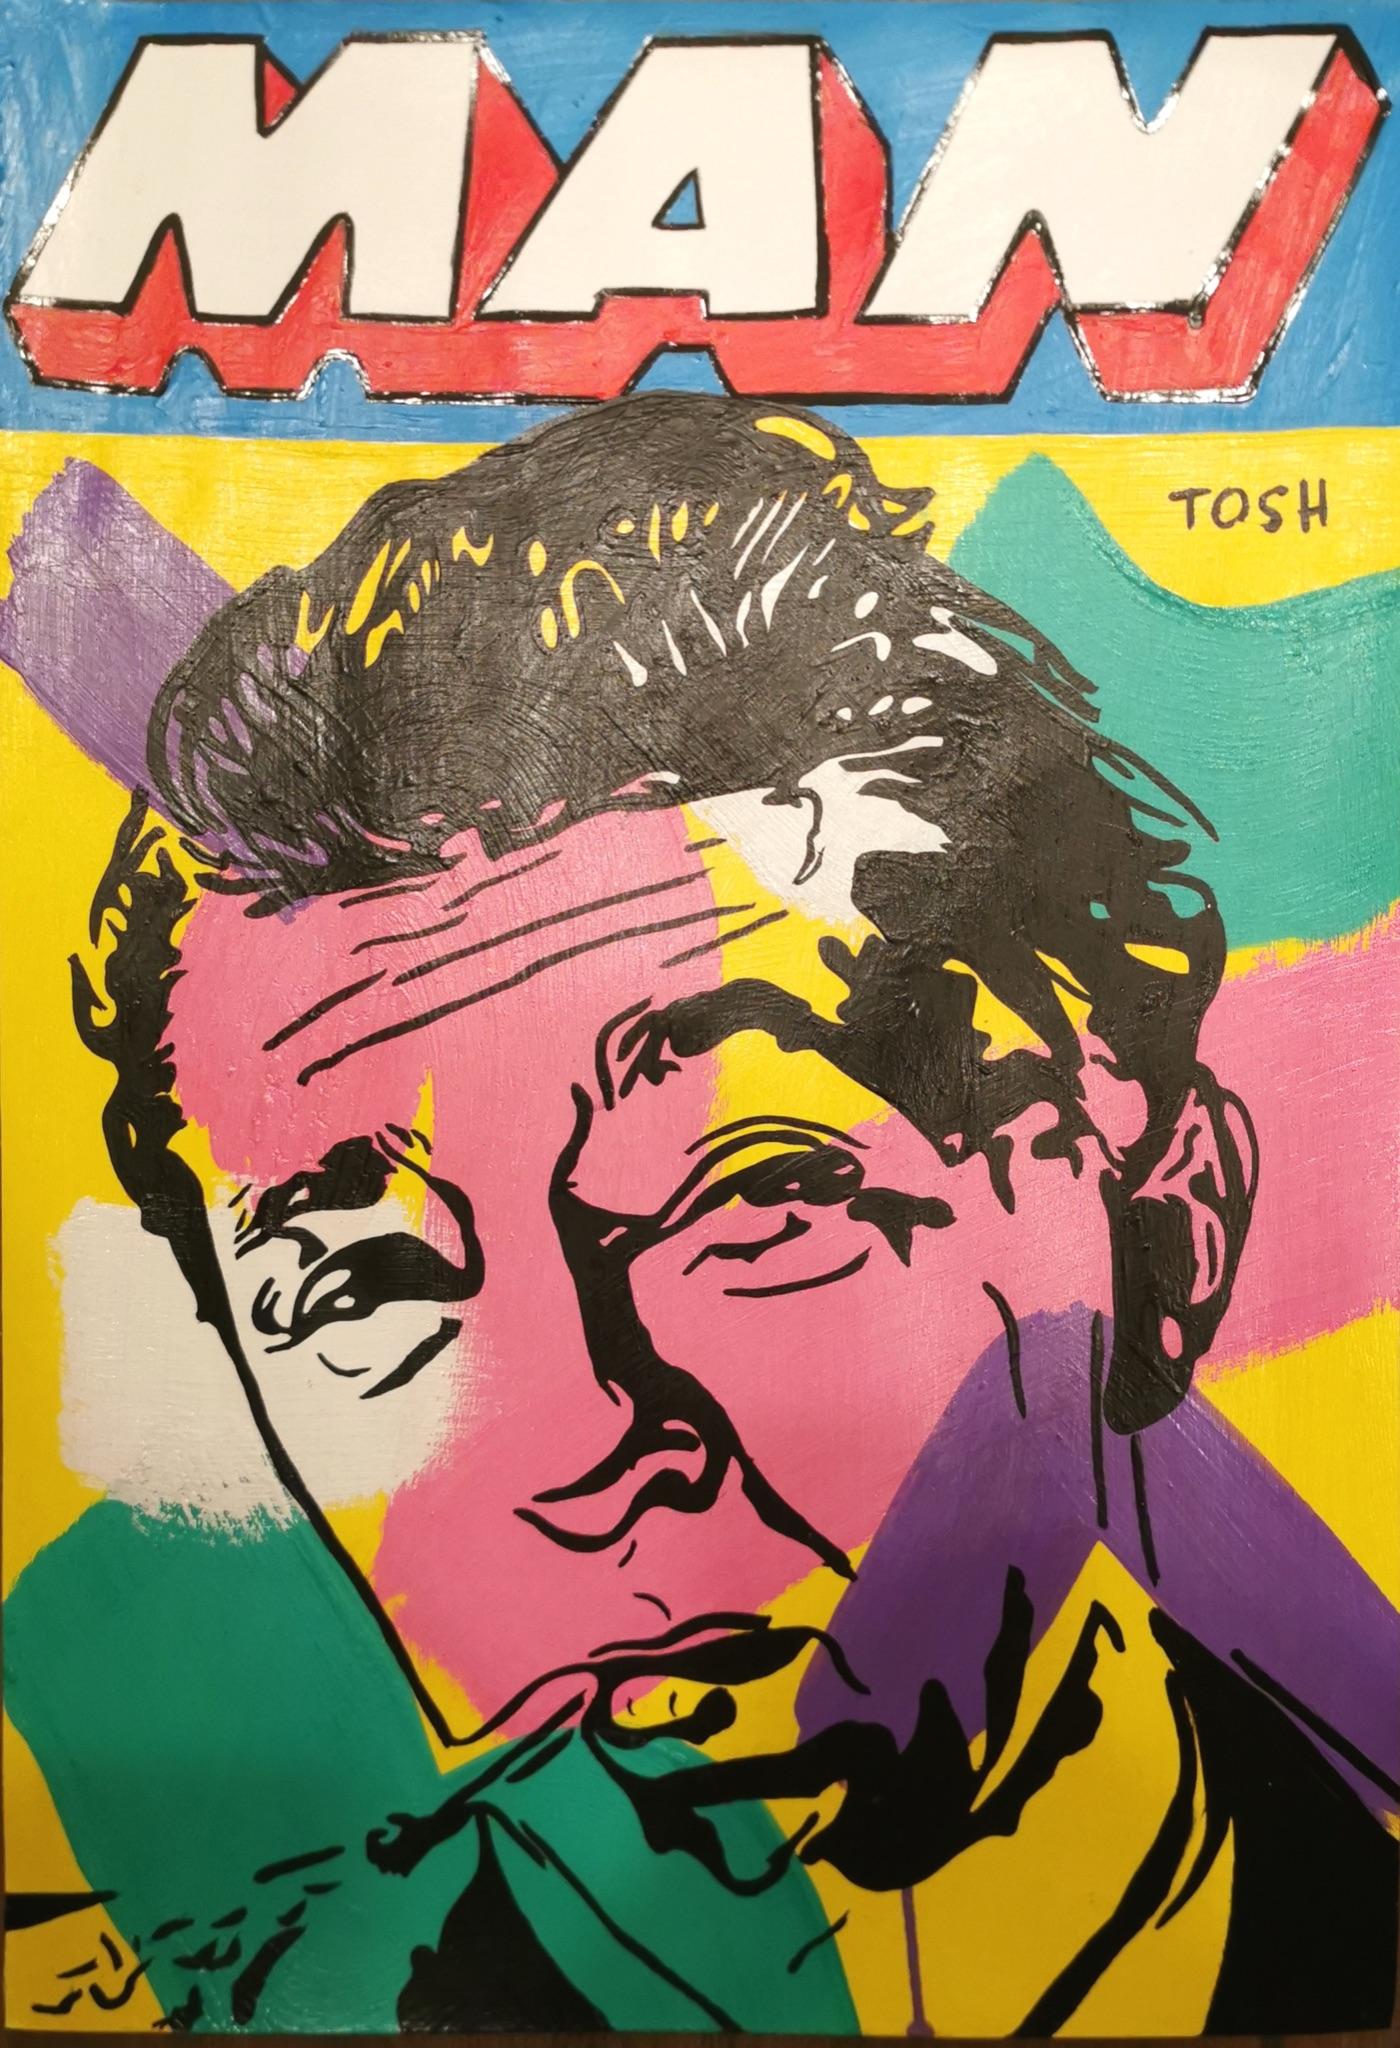 Merlino Bottega D Arte andrew tosh | biography | art collection online for sale on